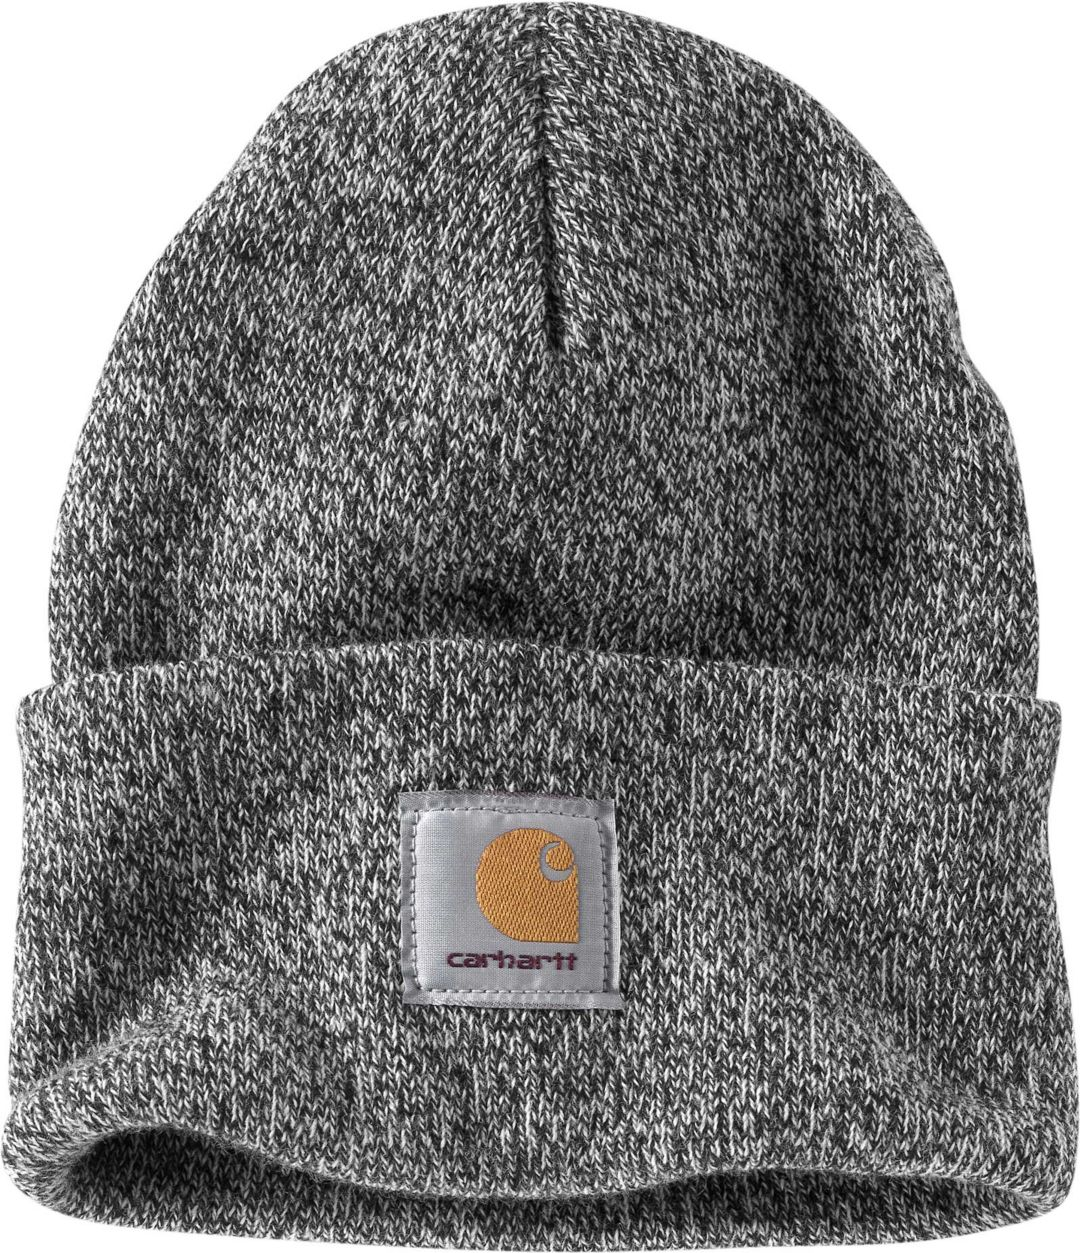 b66bfc029a5dc Carhartt Men s Acrylic Watch Hat 1